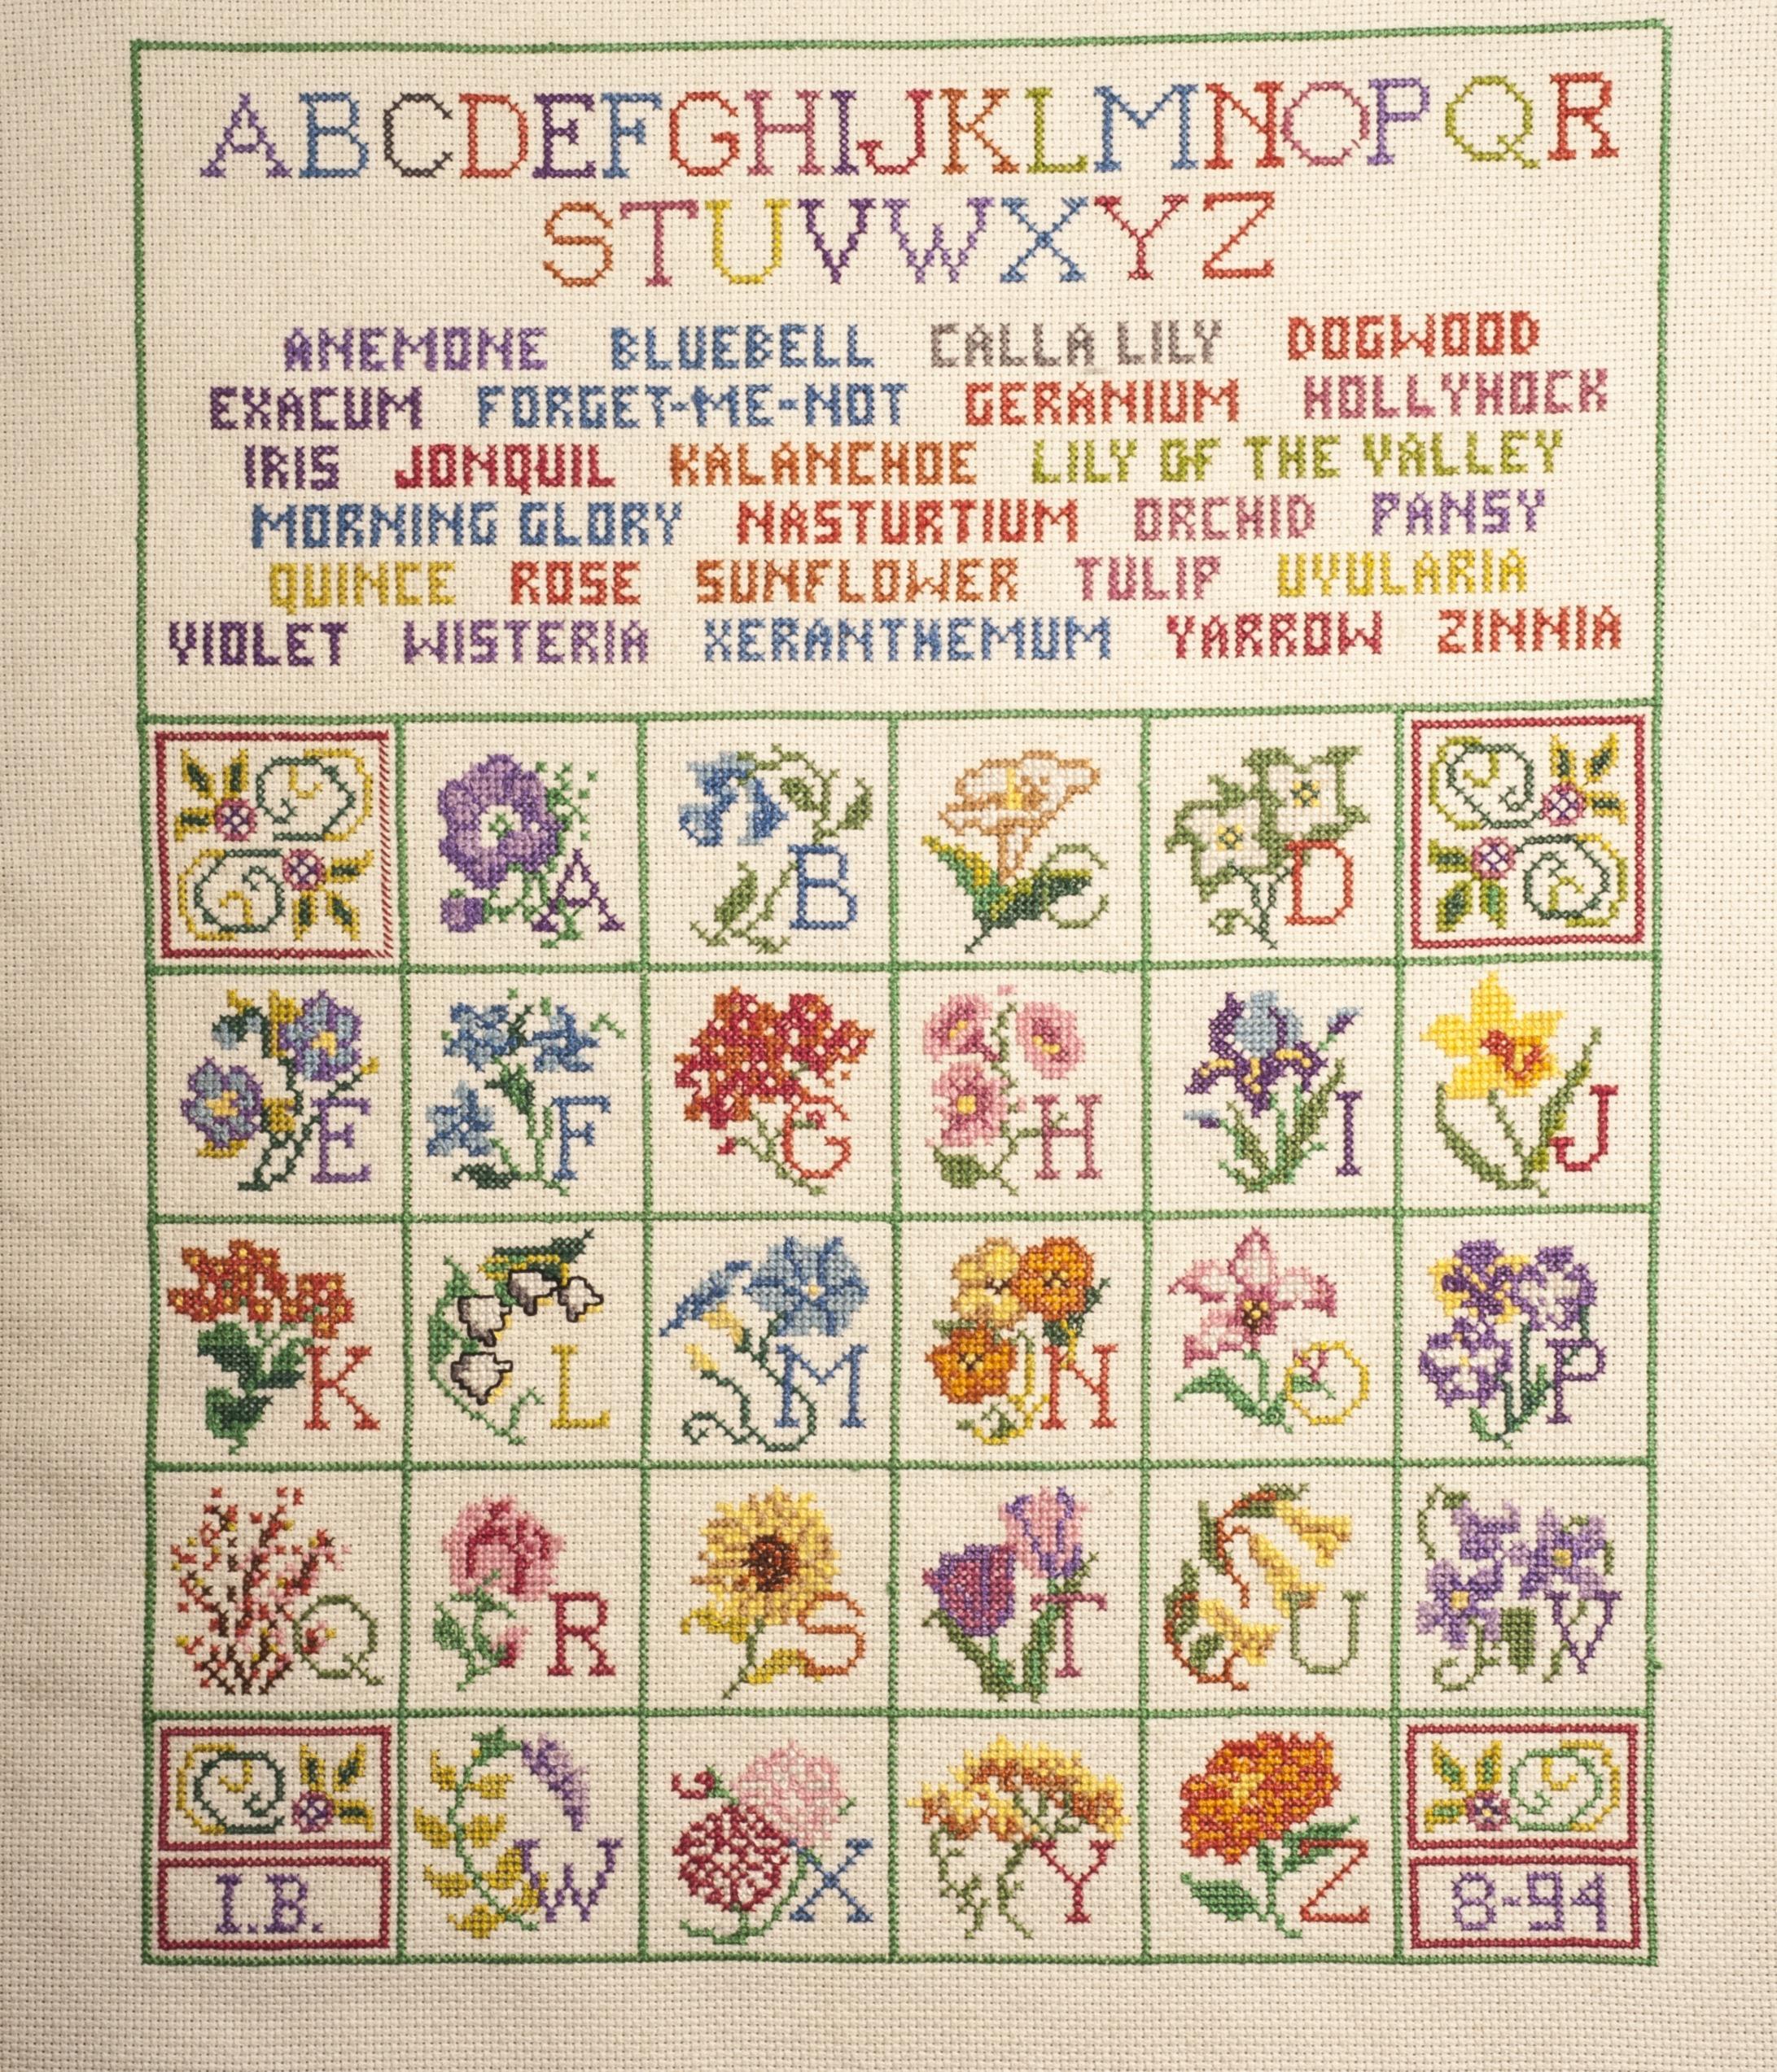 Vintage Botanical Prints - 62 iin a series - Botanical Alphabet Cross-Stitch from the Anacostia Community Museum